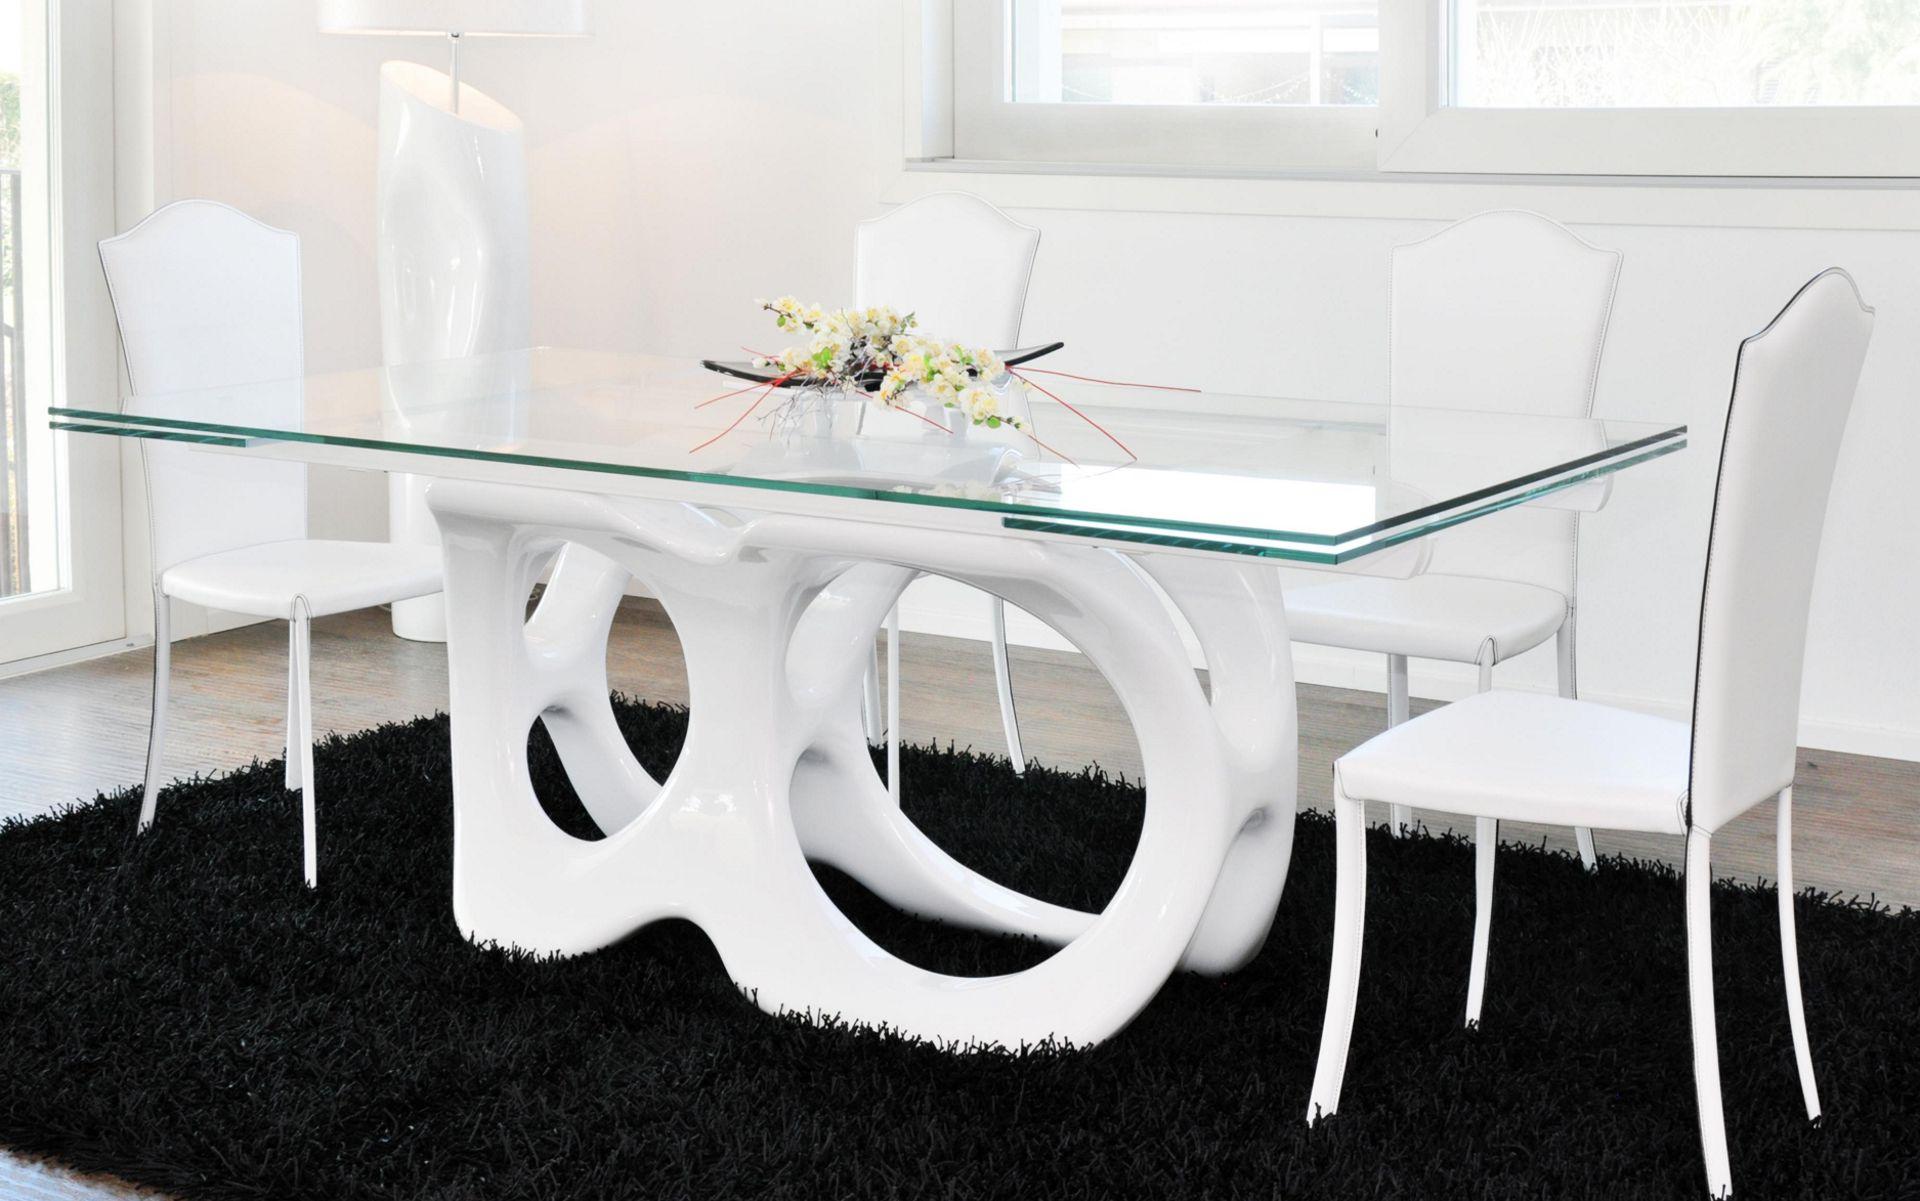 Home design srl boscotrecase unico italia srl casa italia for Mobili design srl